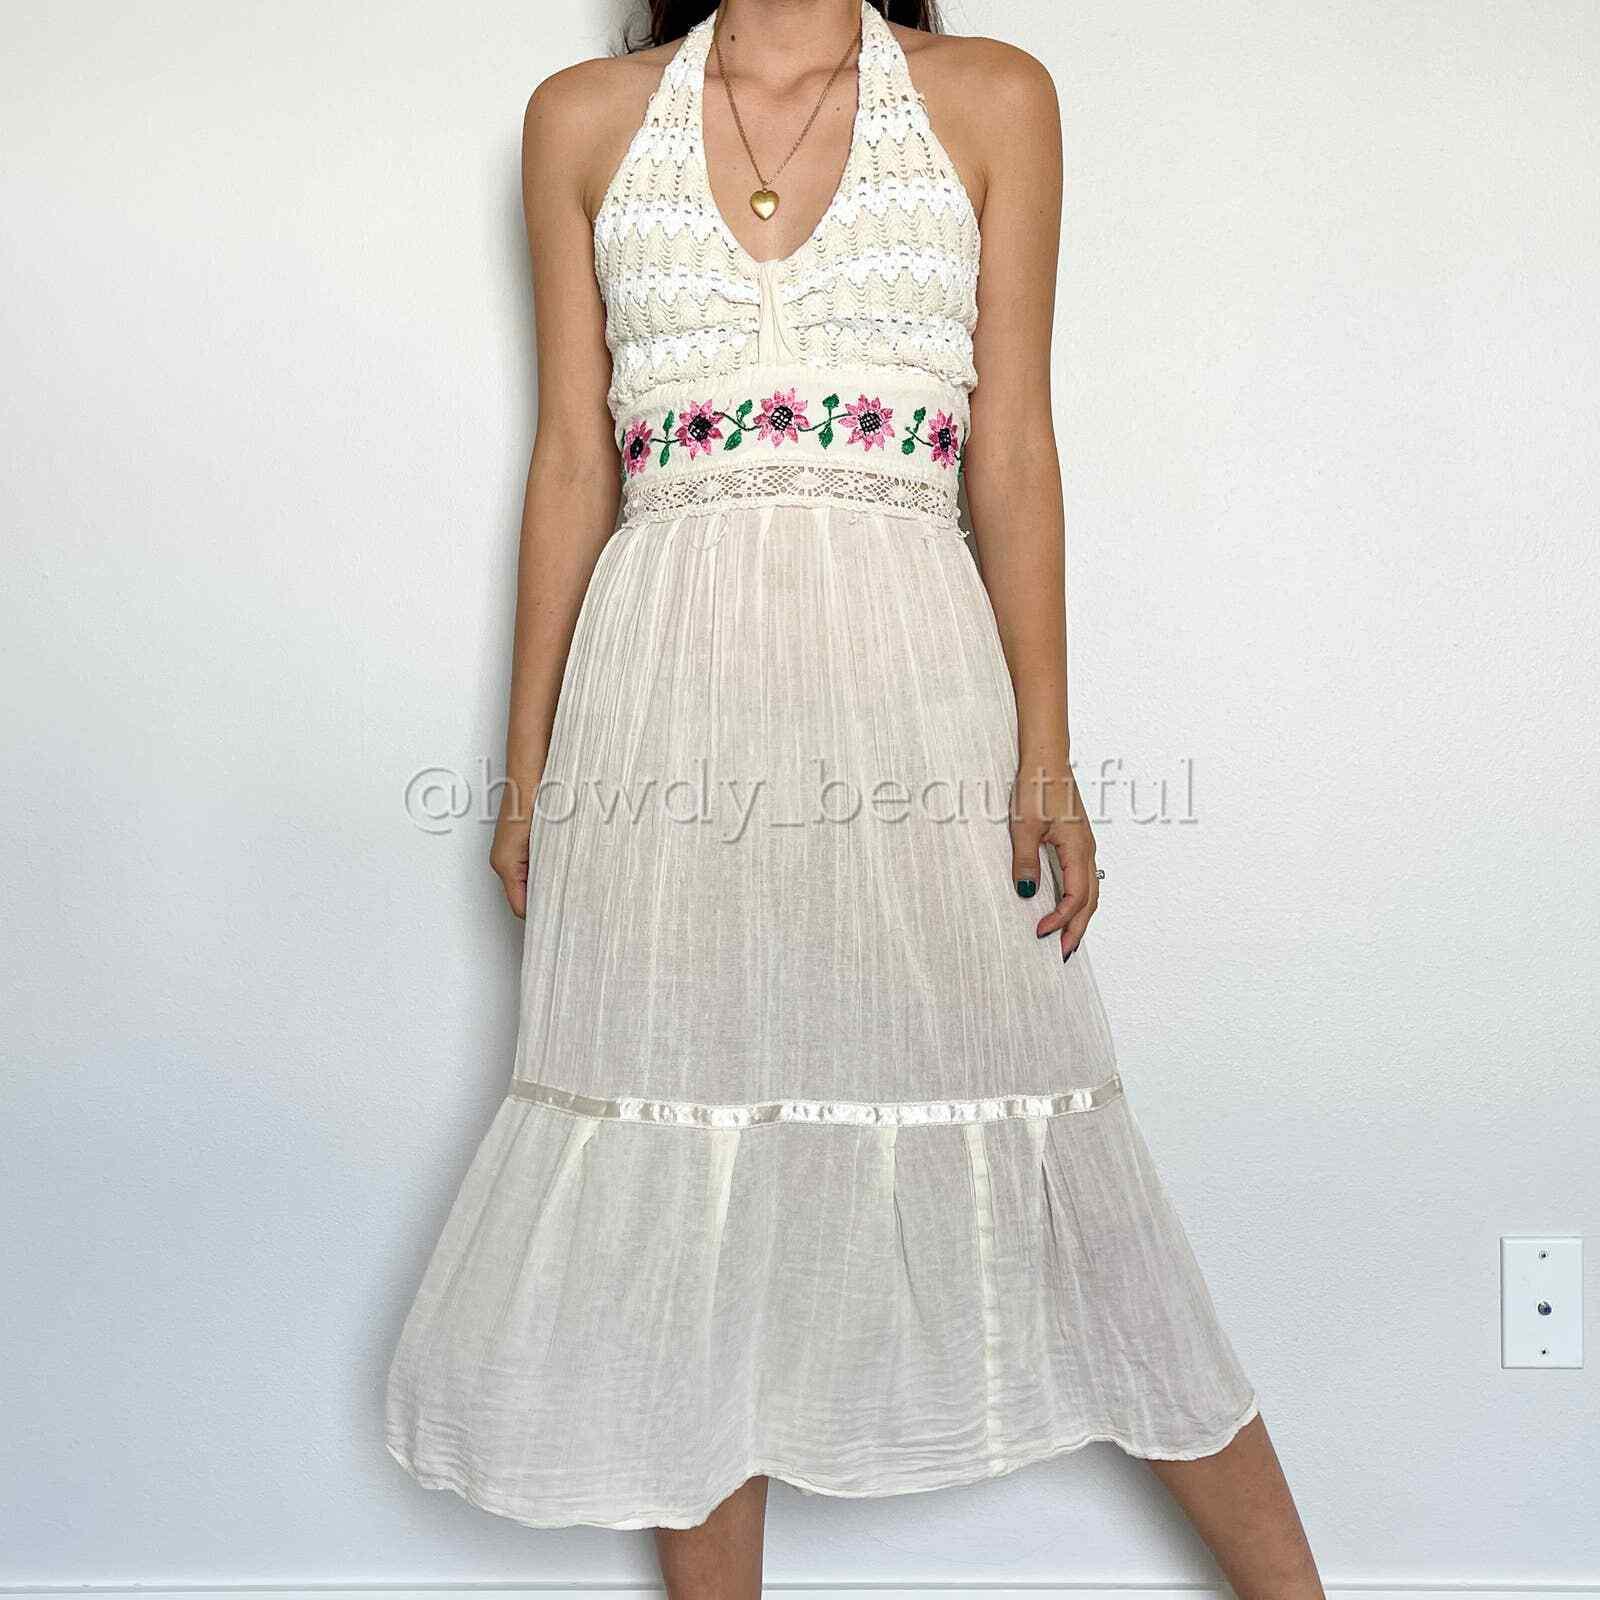 Mexican Dress Crochet Embroidered Boho Gauze - image 1